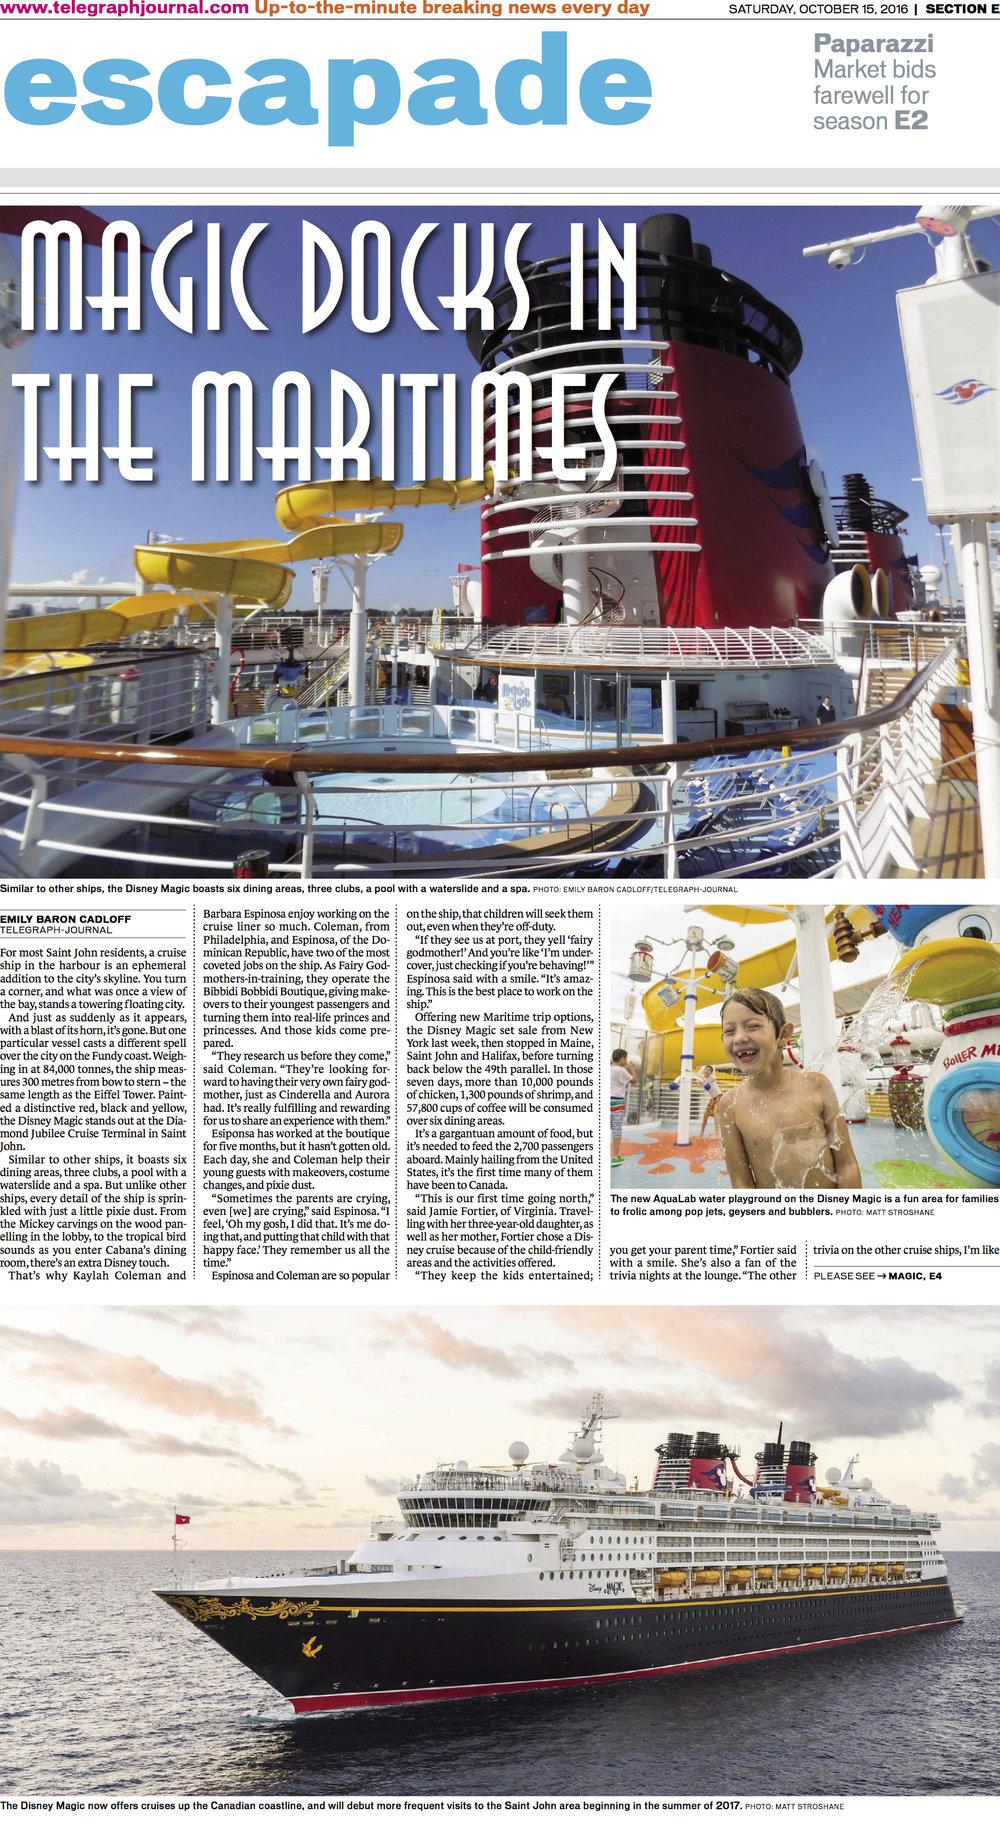 Cover, Escapade, Telegraph-Journal. Oct. 15, 2016